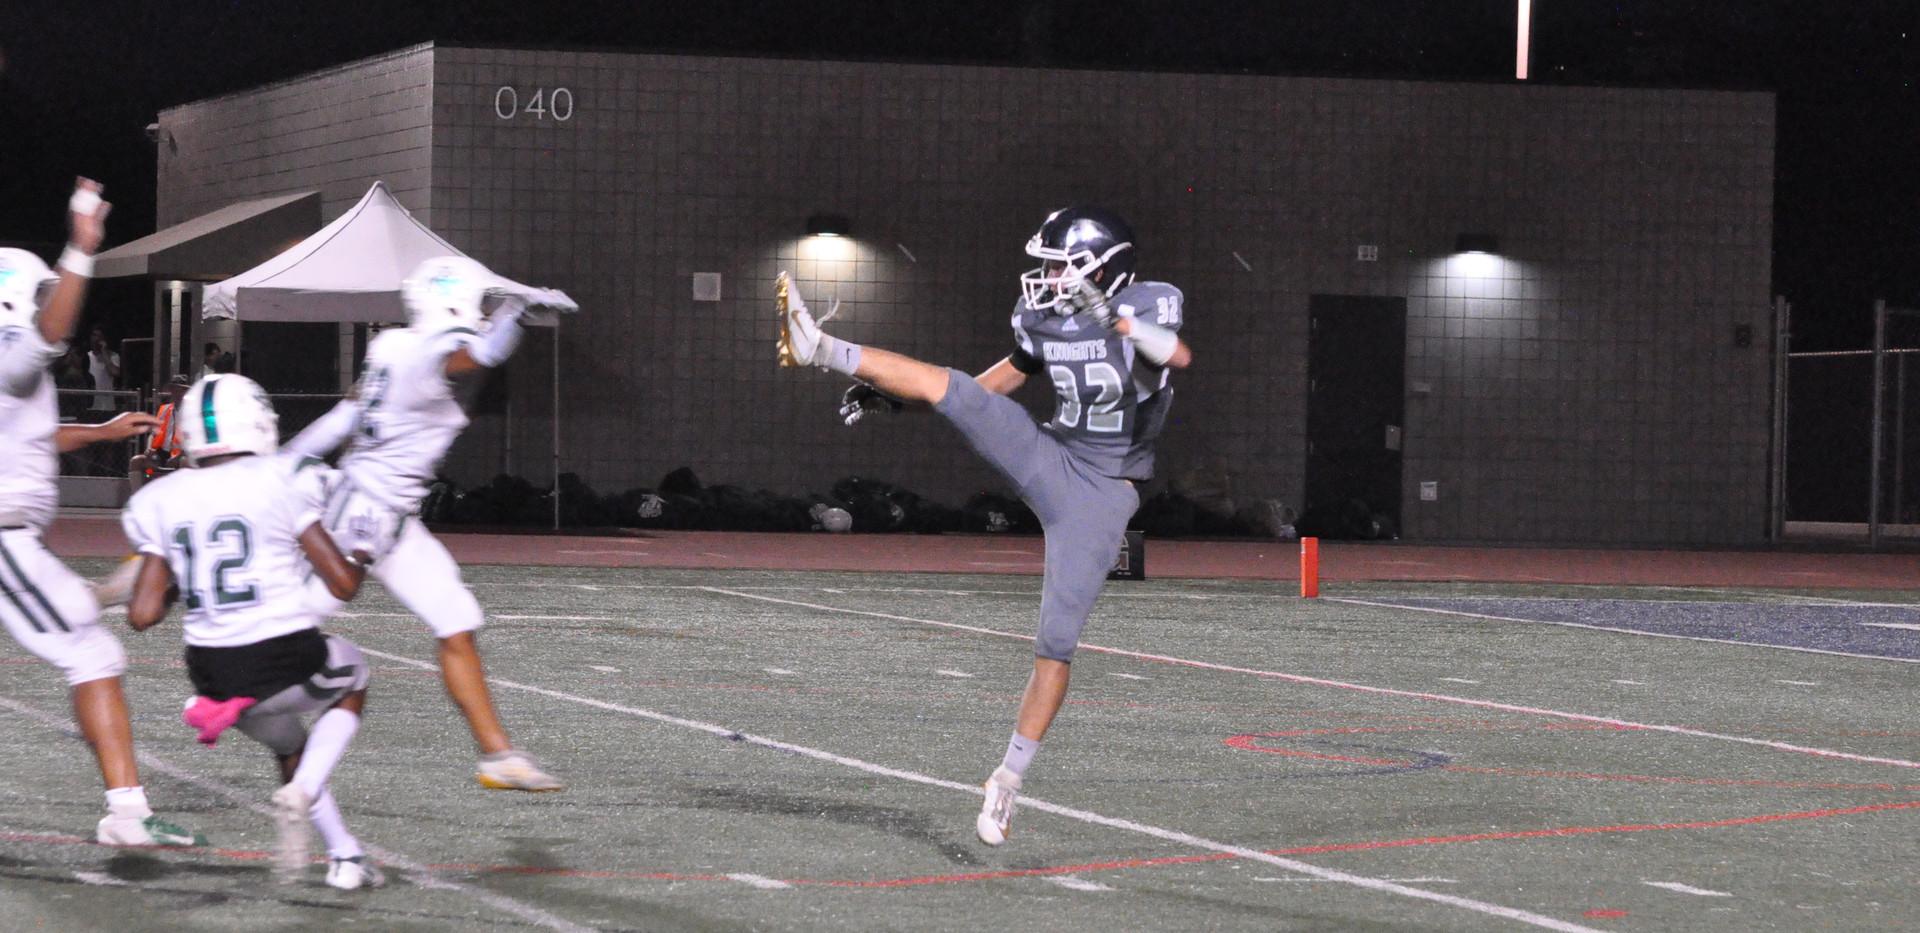 32 kicking ball high leg.JPG